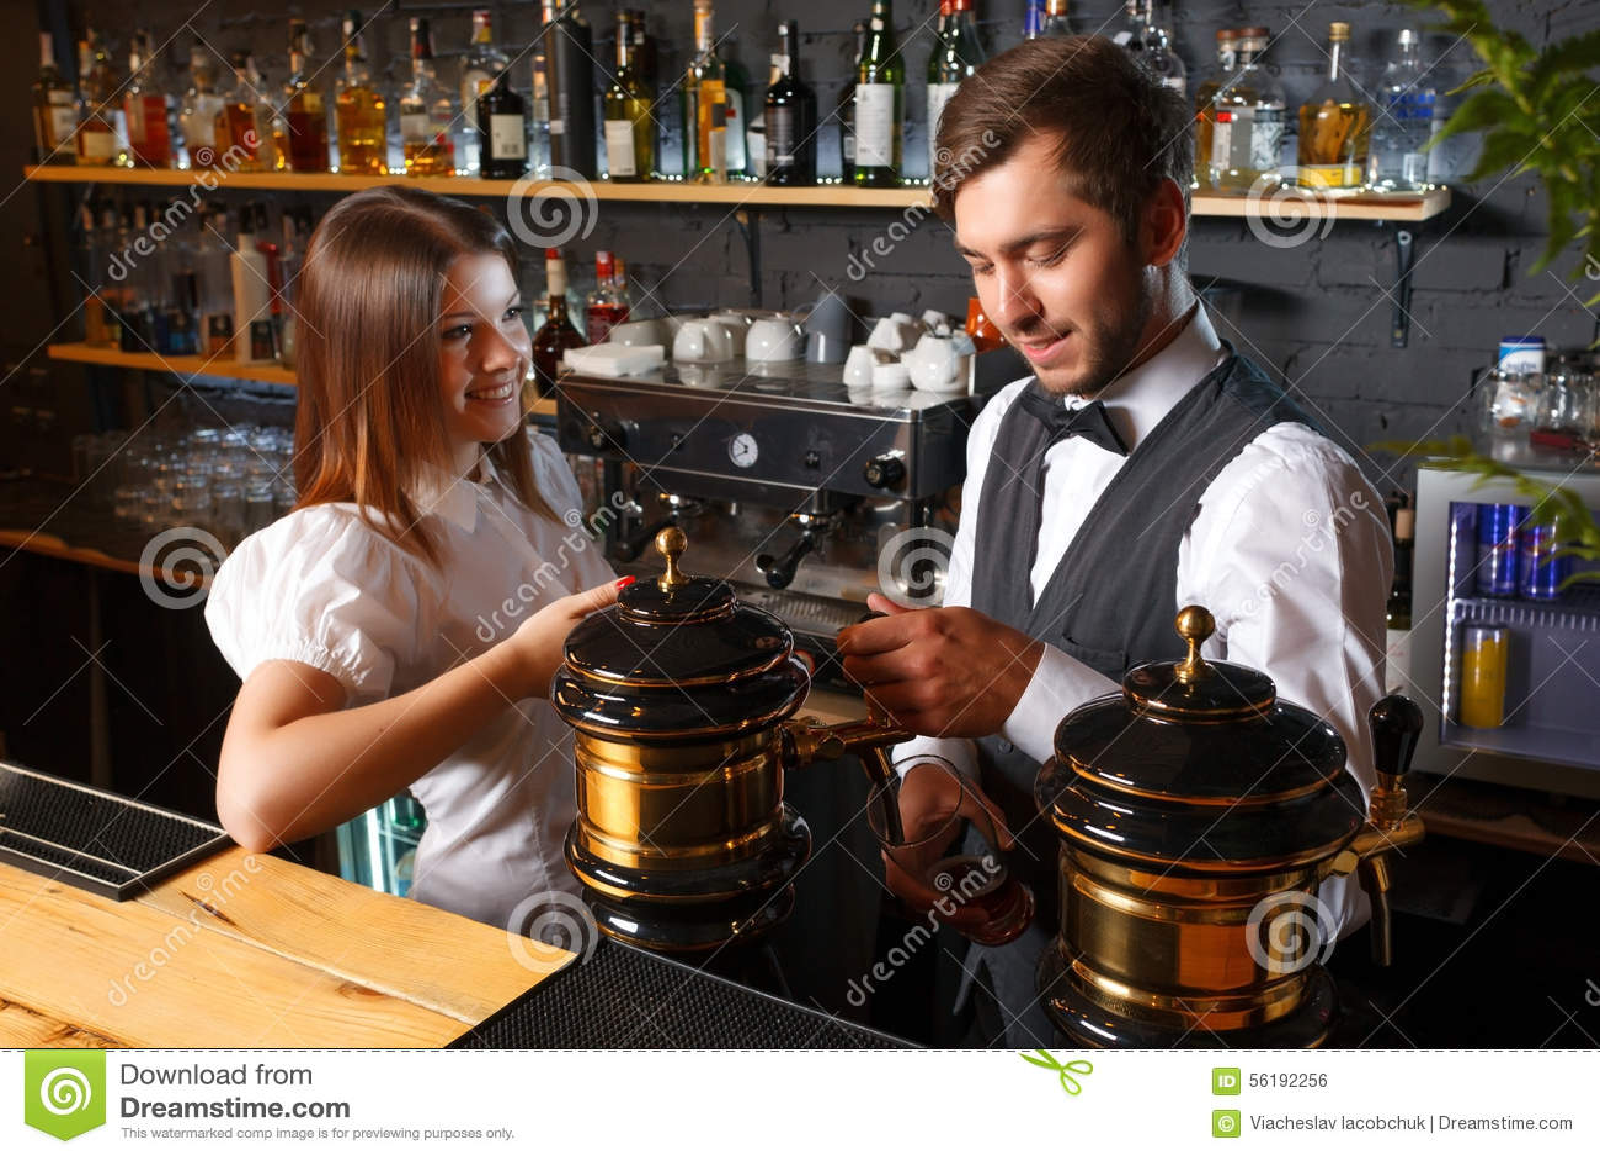 Официантки в трусиках в баре фото 668-243